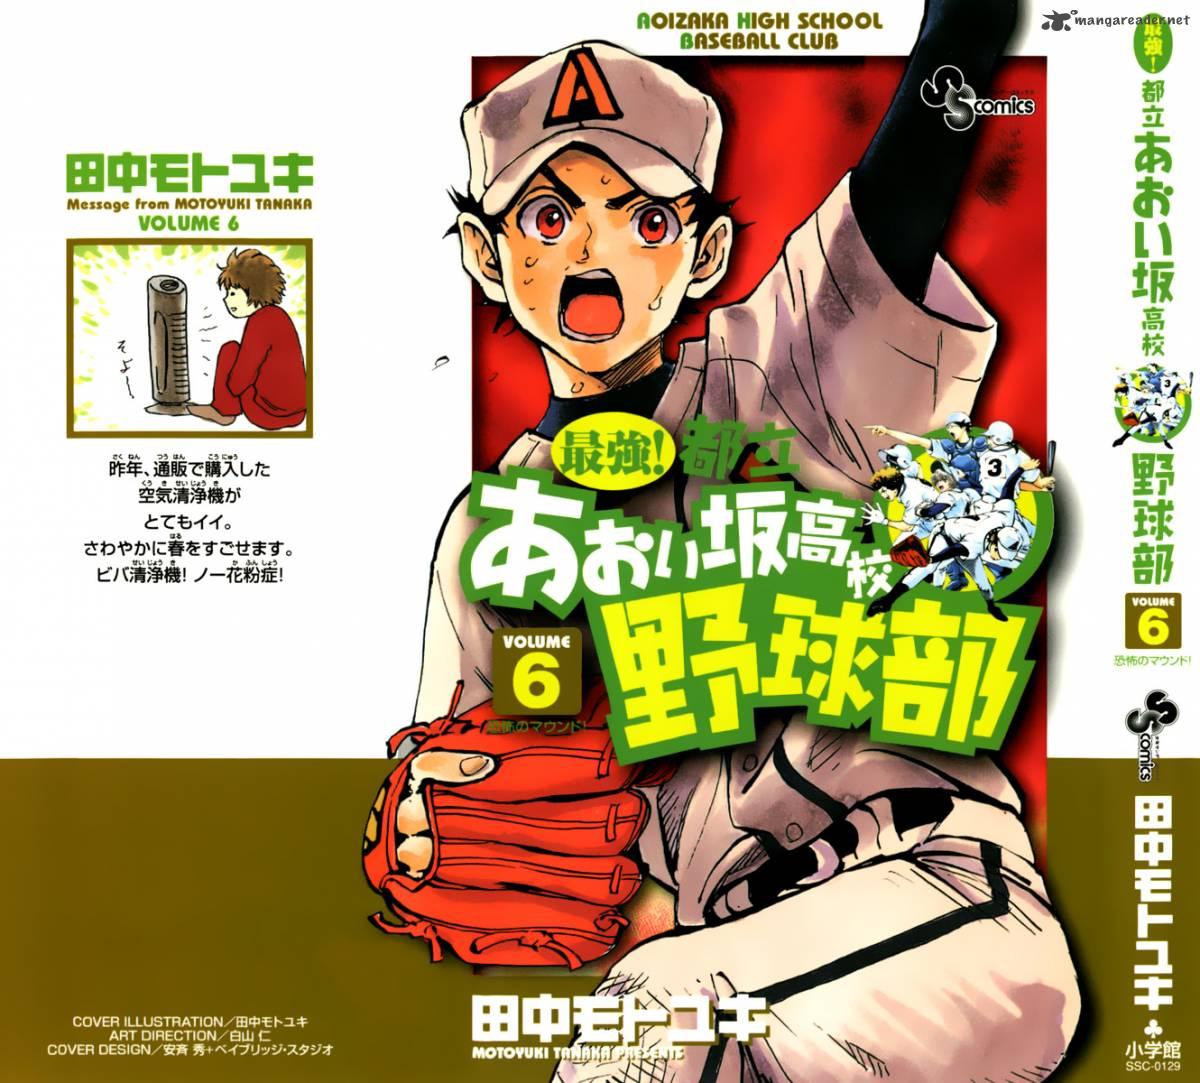 Daftar Pemenang Kodansha Manga Award Kategori Shounen Tahun 2000-2010 3